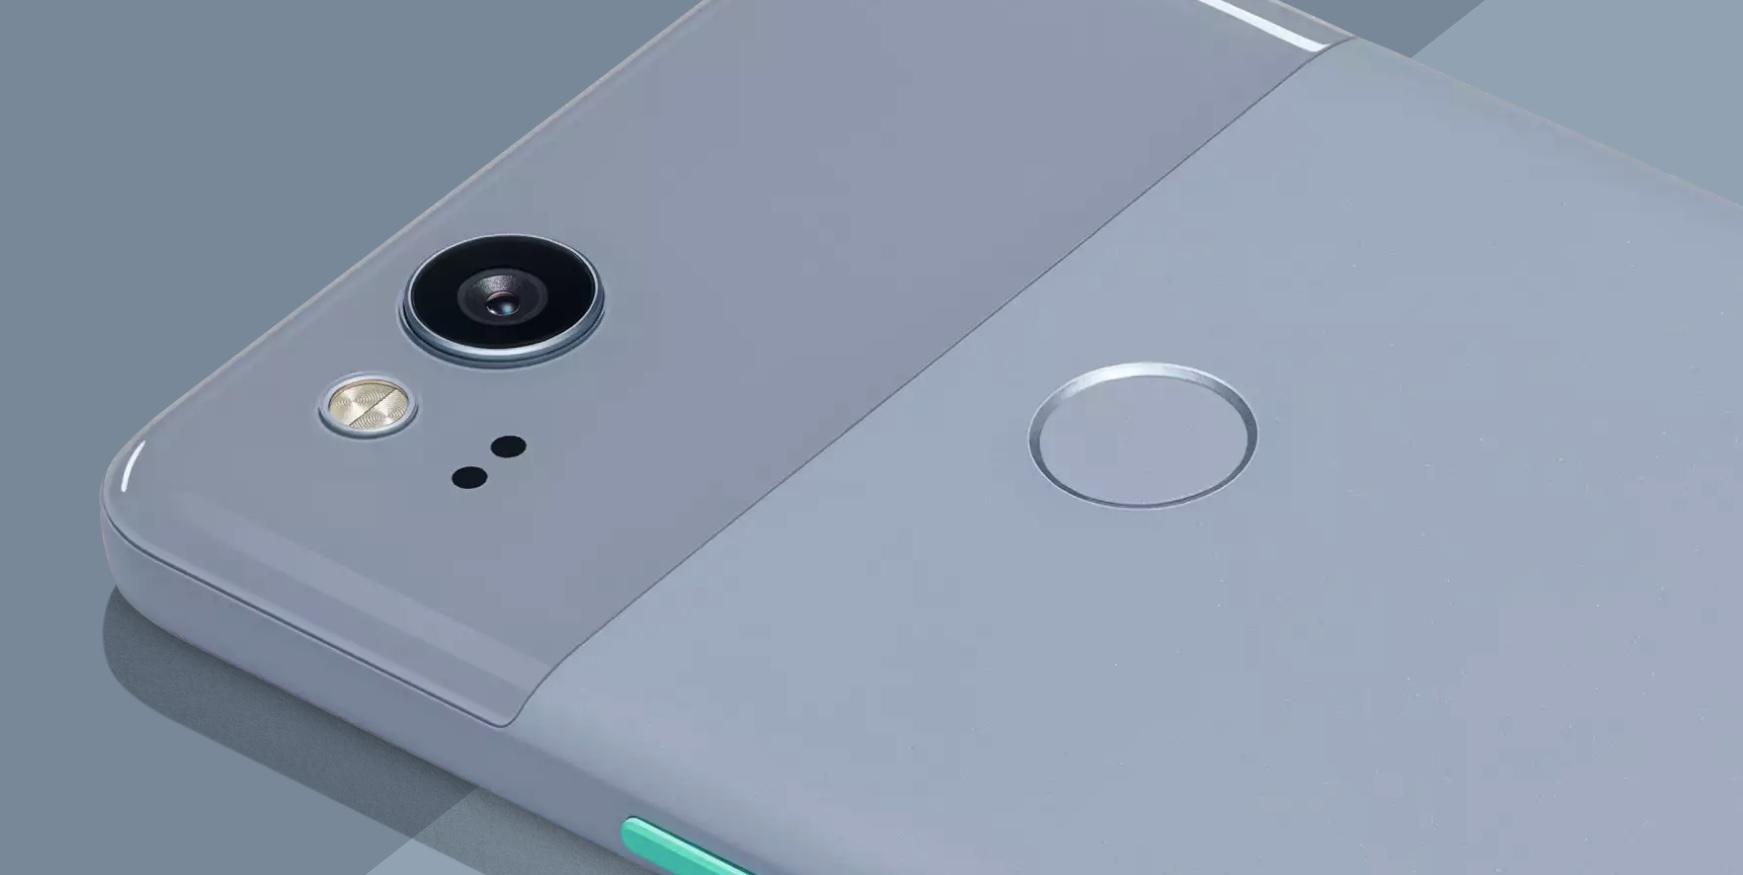 Vi får Google Pixel XL 2 inn til test 18. oktober.